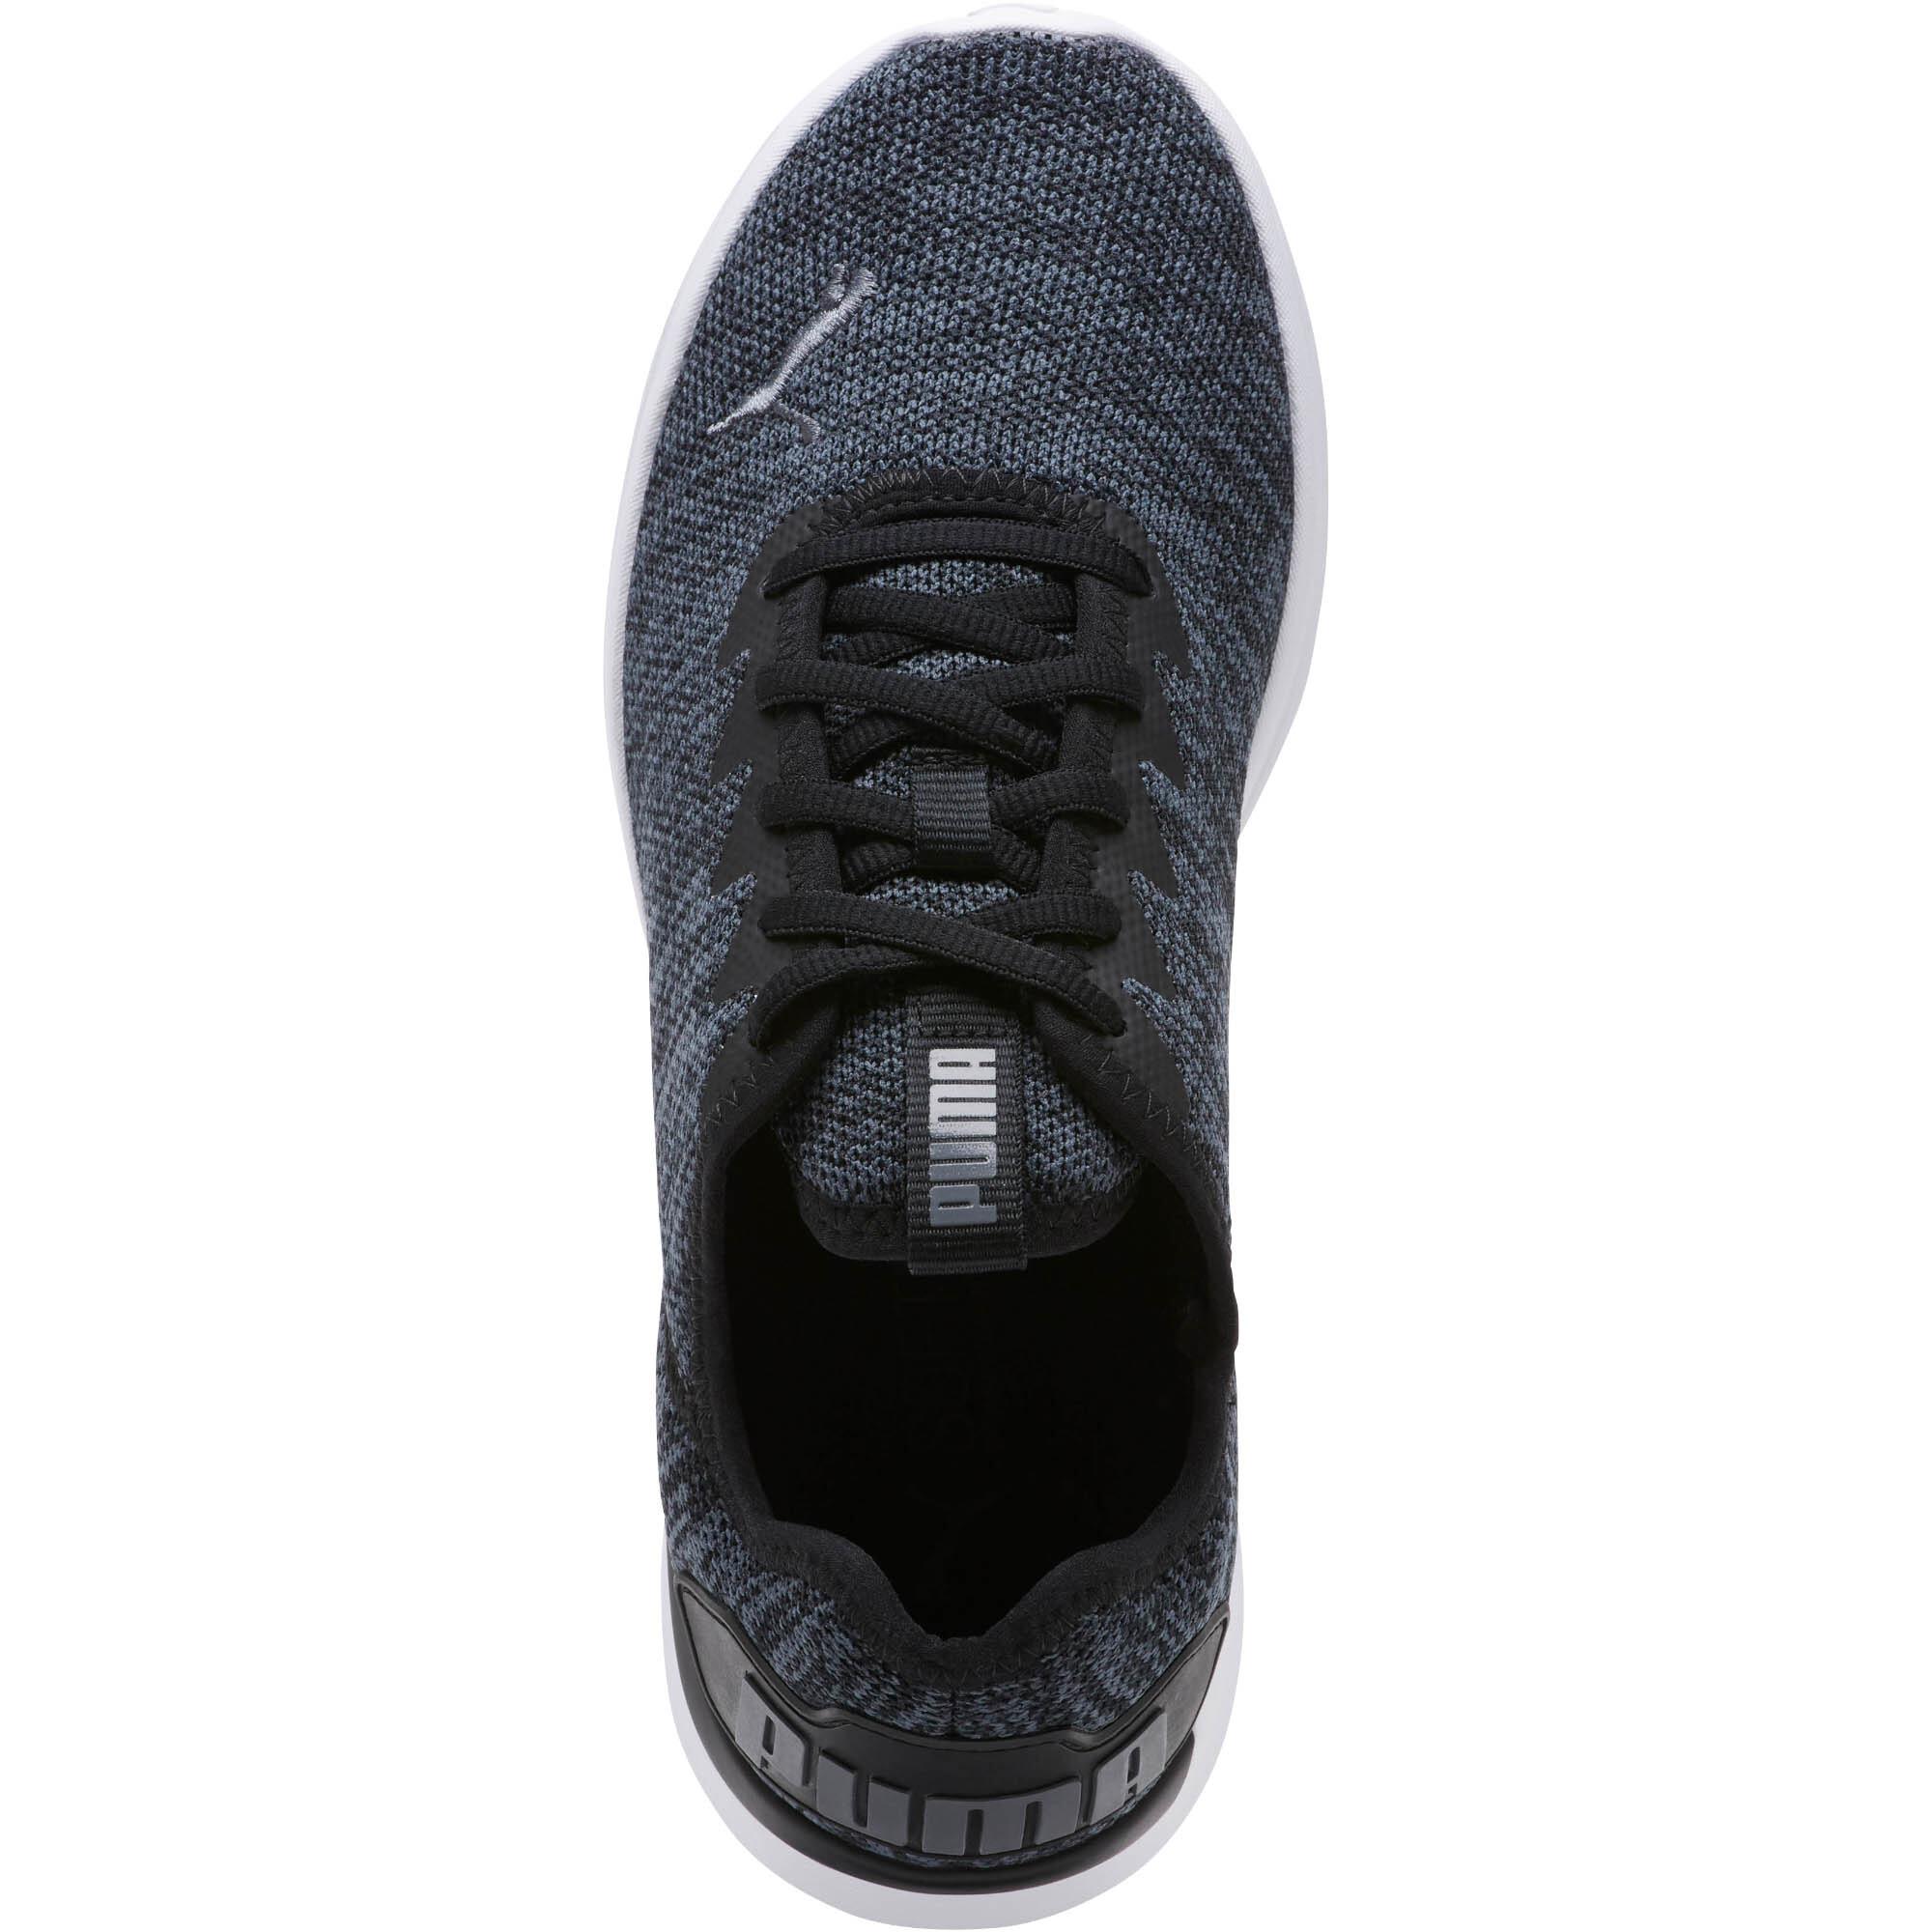 PUMA-Ballast-Women-039-s-Running-Shoes-Women-Shoe-Running thumbnail 6